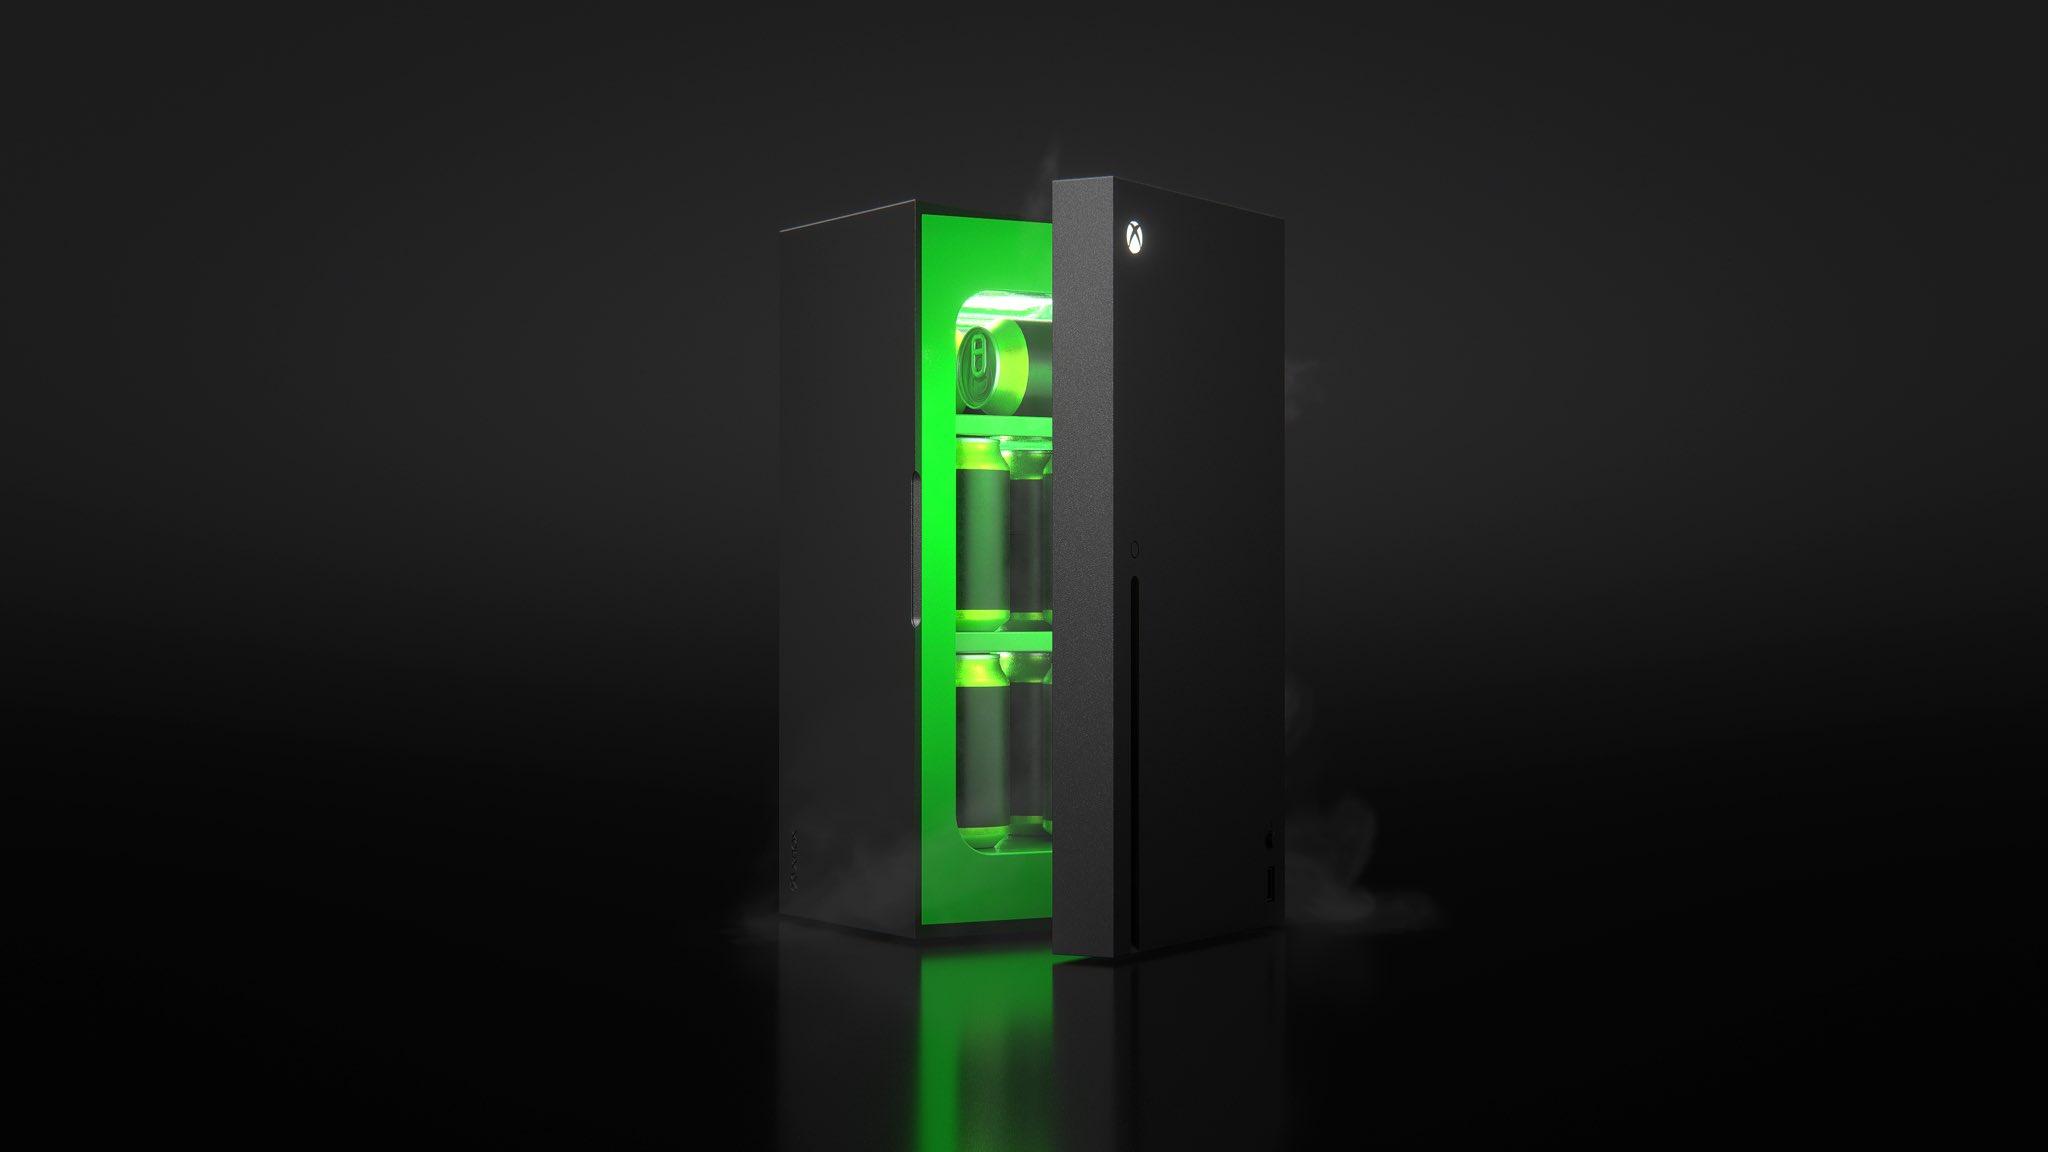 Le mini frigo Xbox ne sera pas vendu qu'aux US